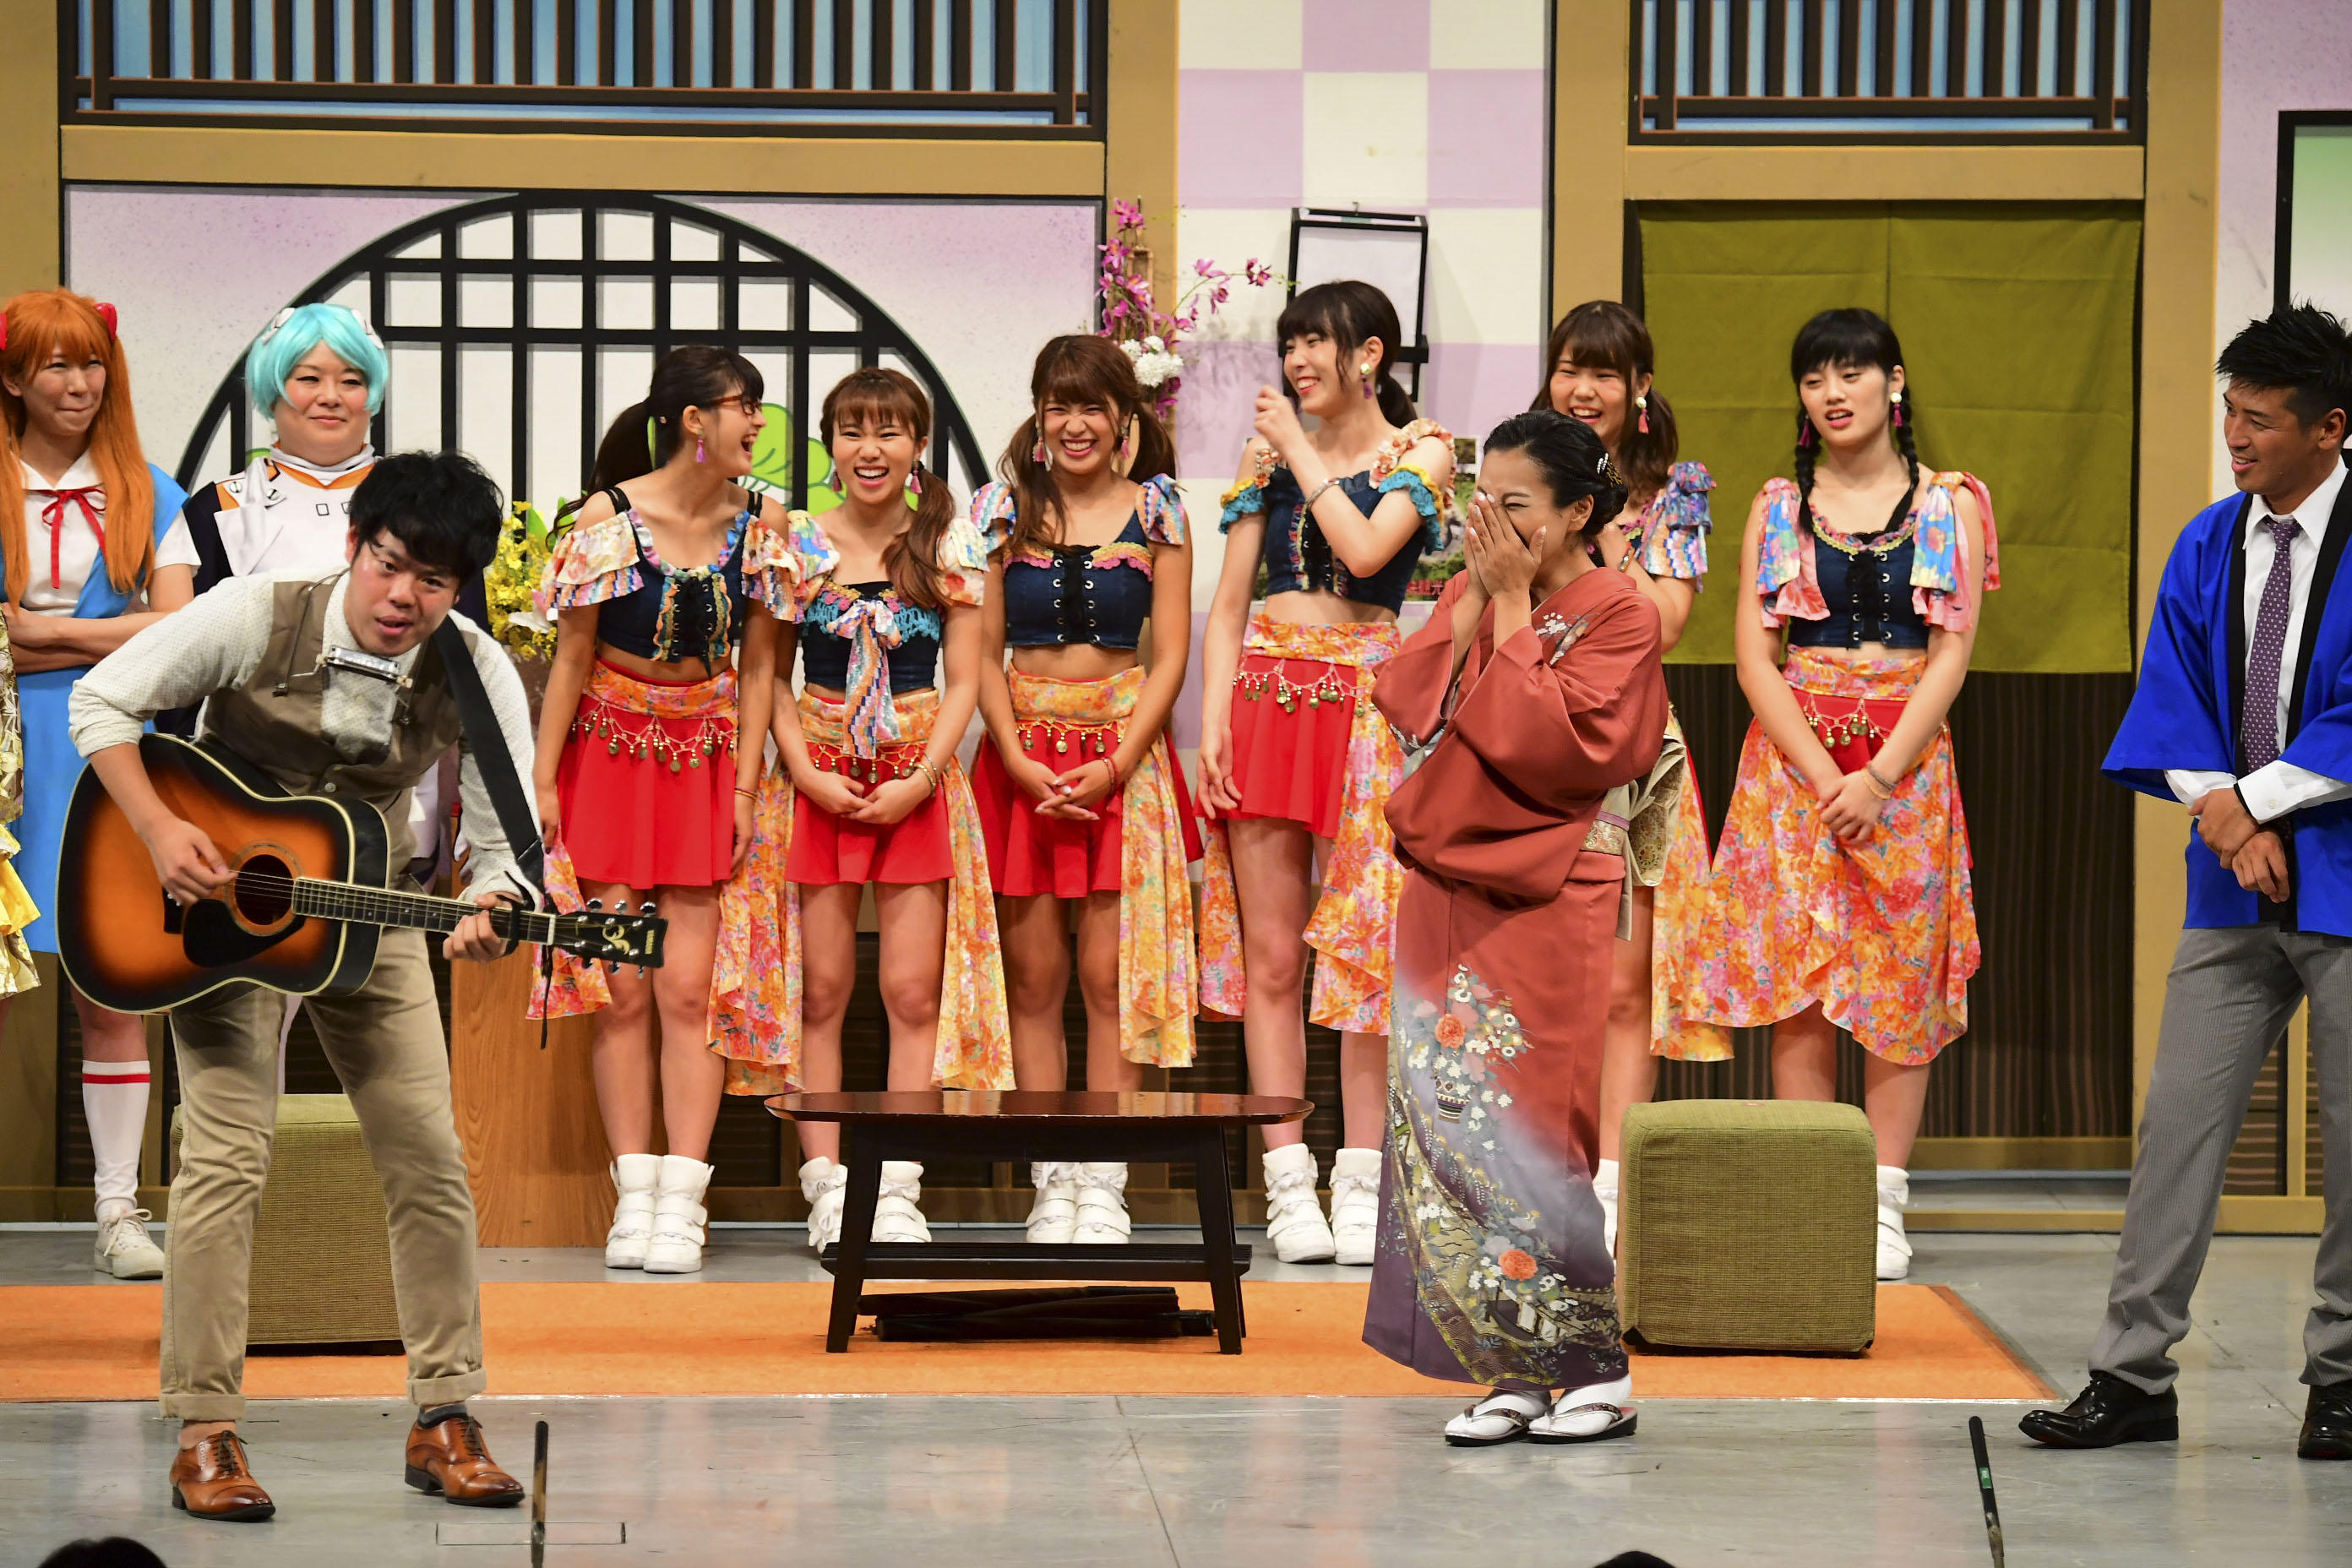 http://news.yoshimoto.co.jp/20170909191547-30595a60633a83b95c43abe08f4e16d9e478d5e8.jpg